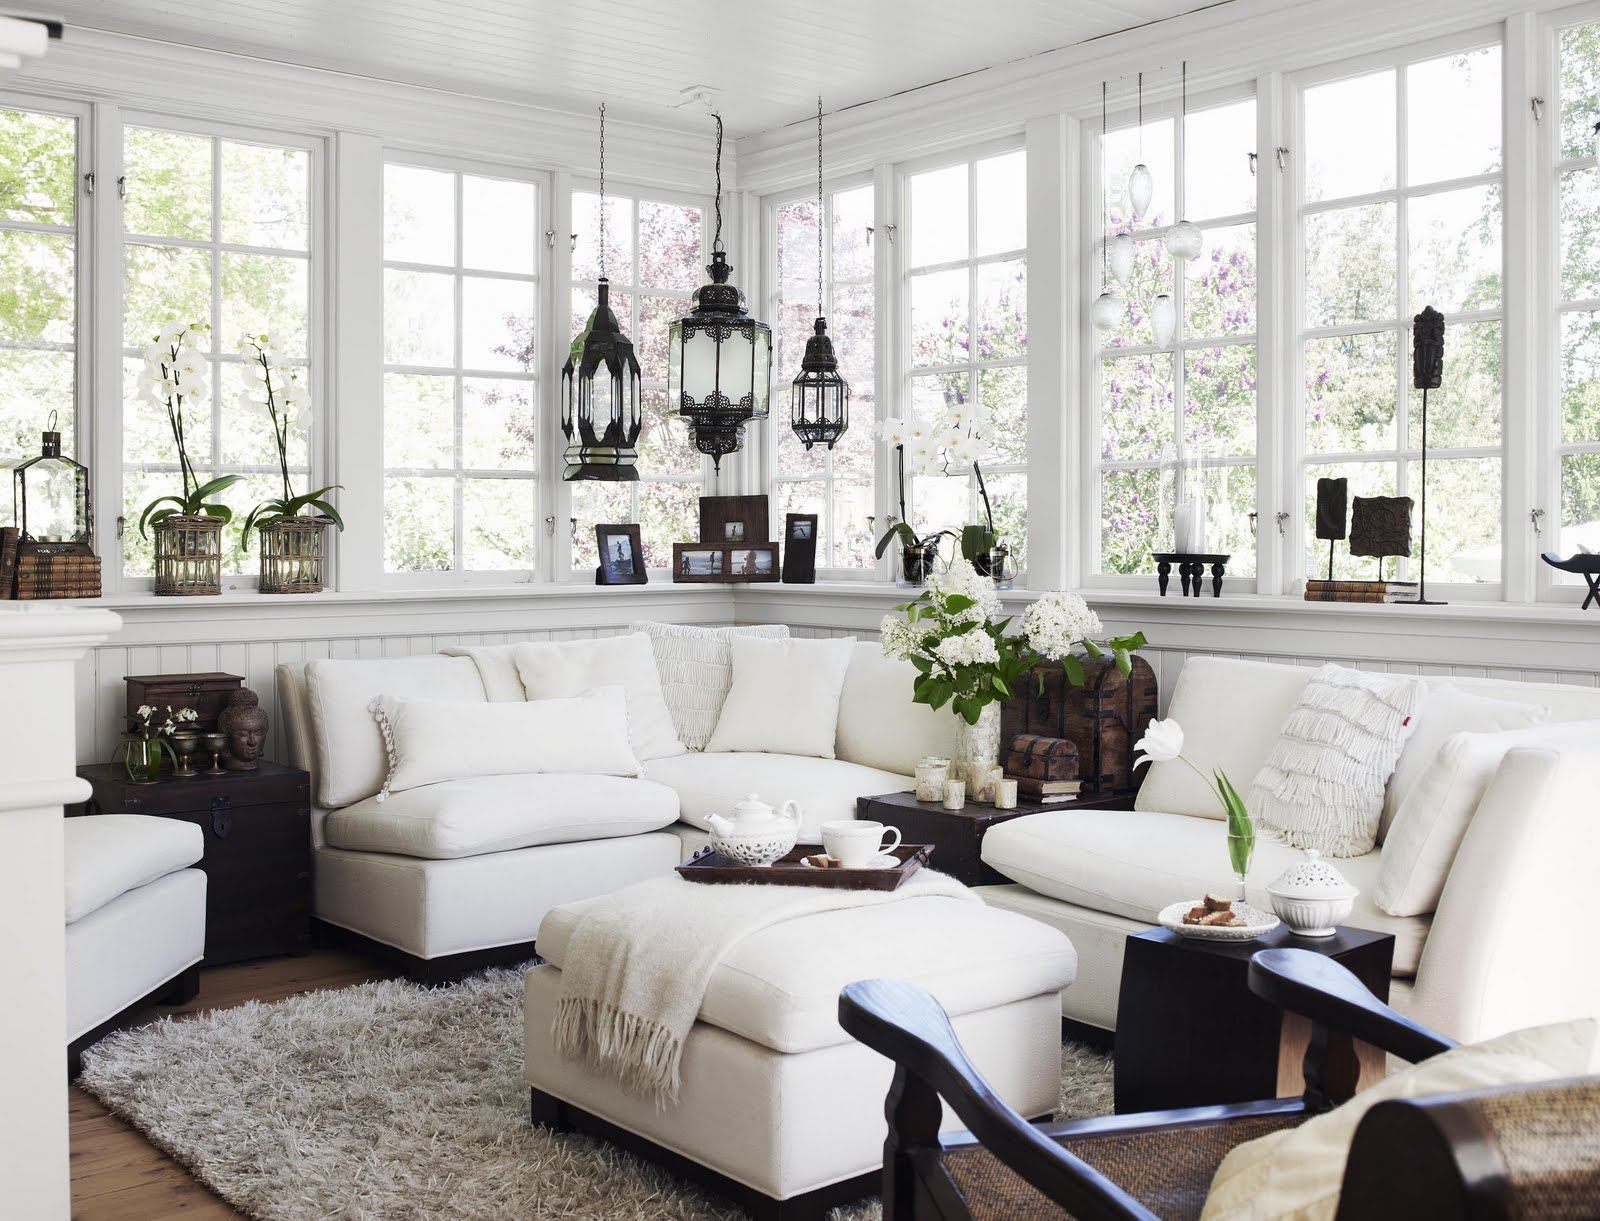 Window ideas for a sunroom  den vita dröm gården augusti   spaces  pinterest  sunroom